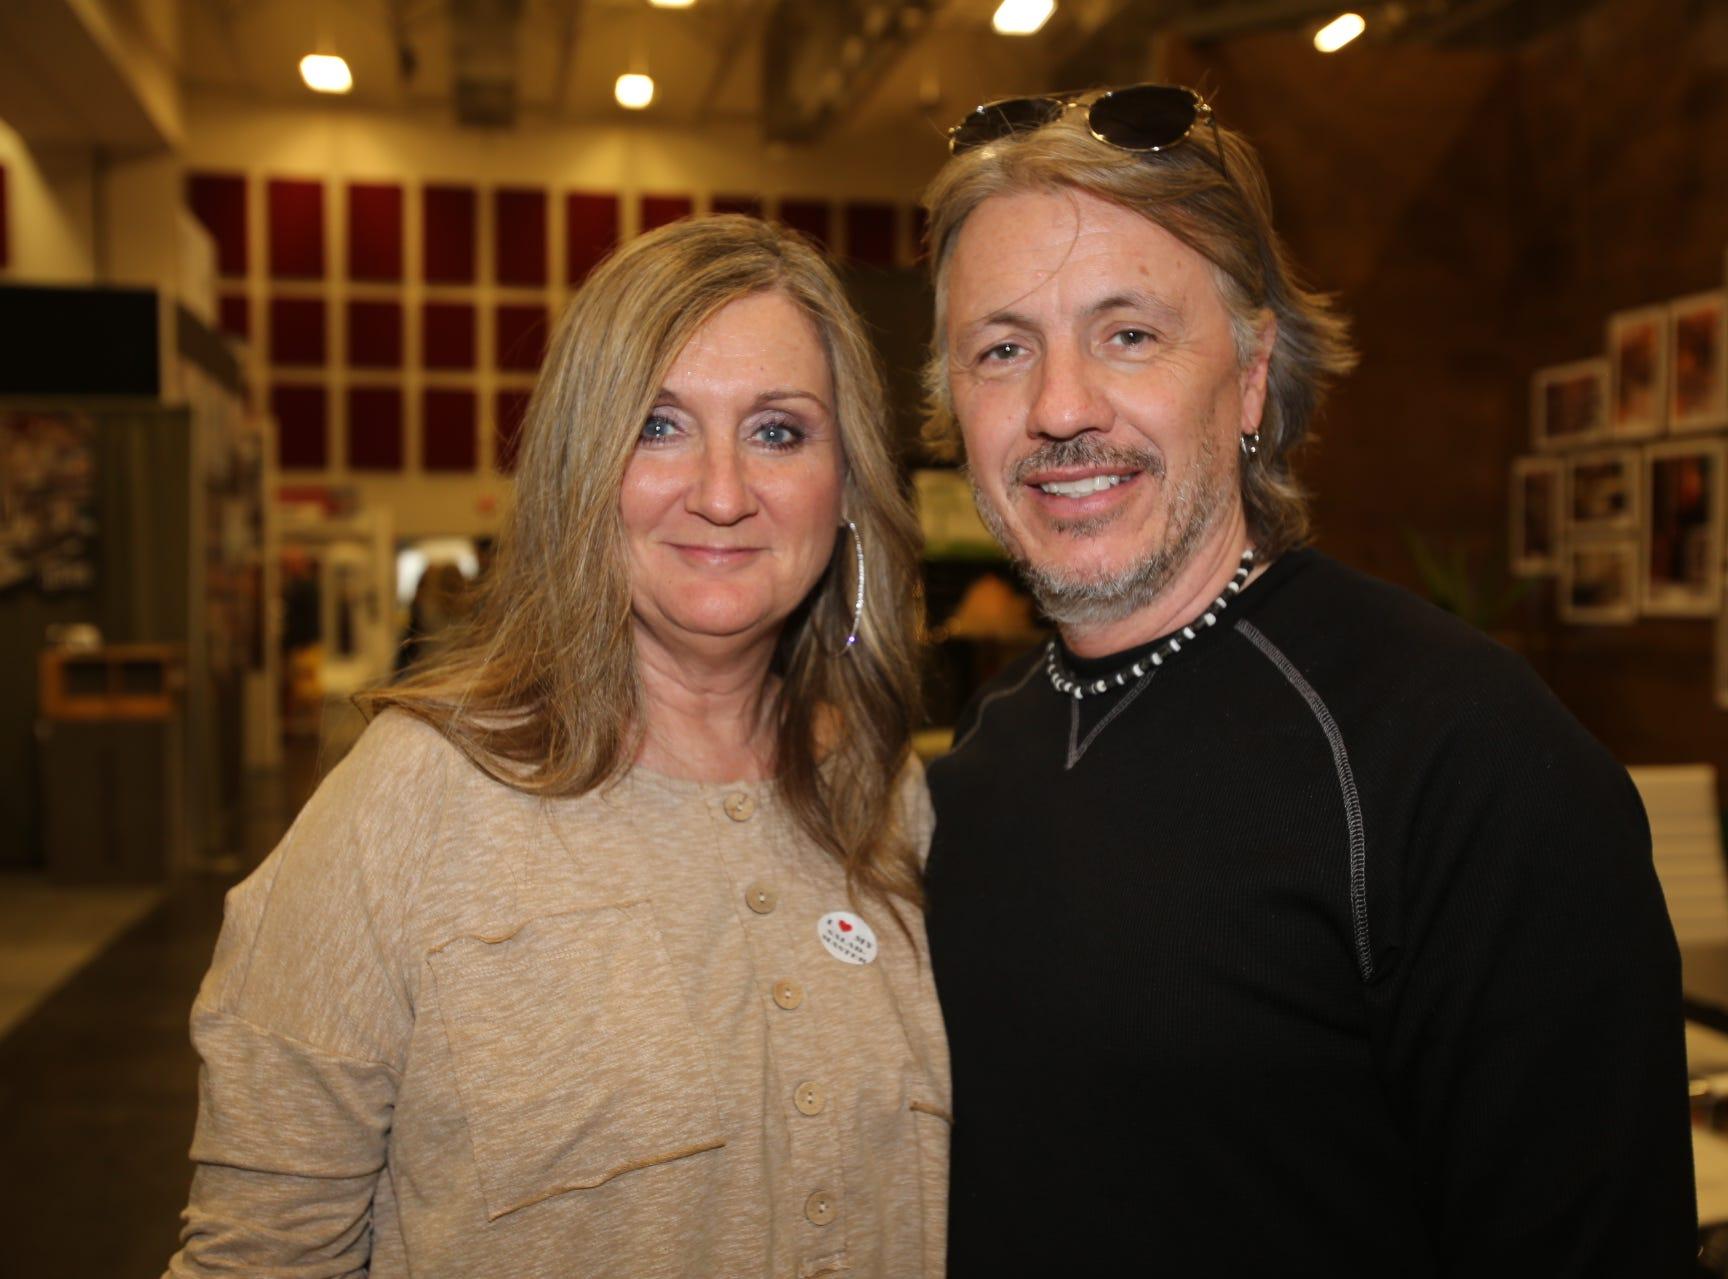 Lori and Michael Leach